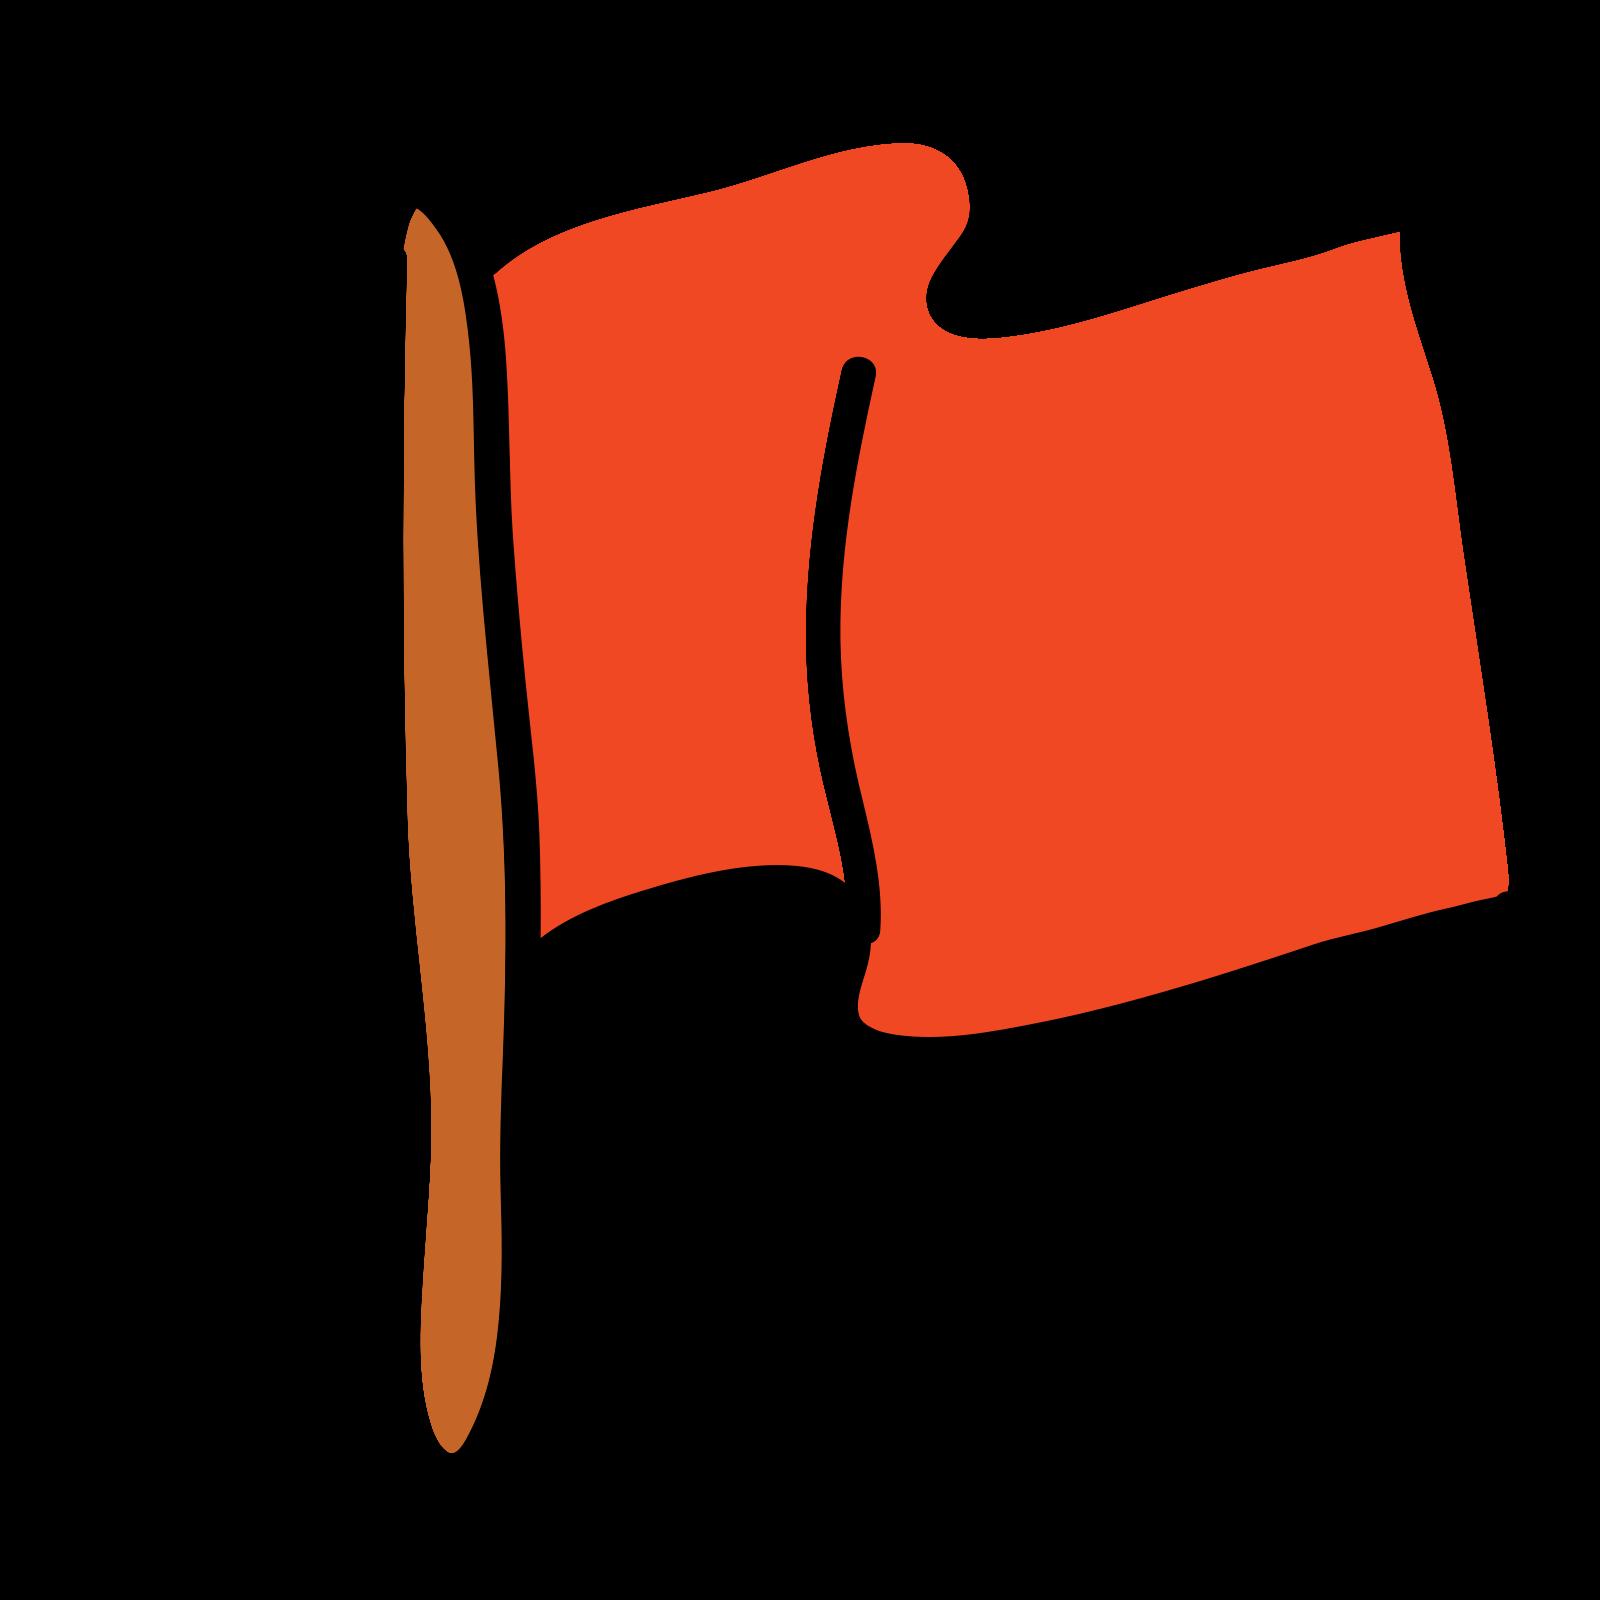 Wypełniona flaga icon